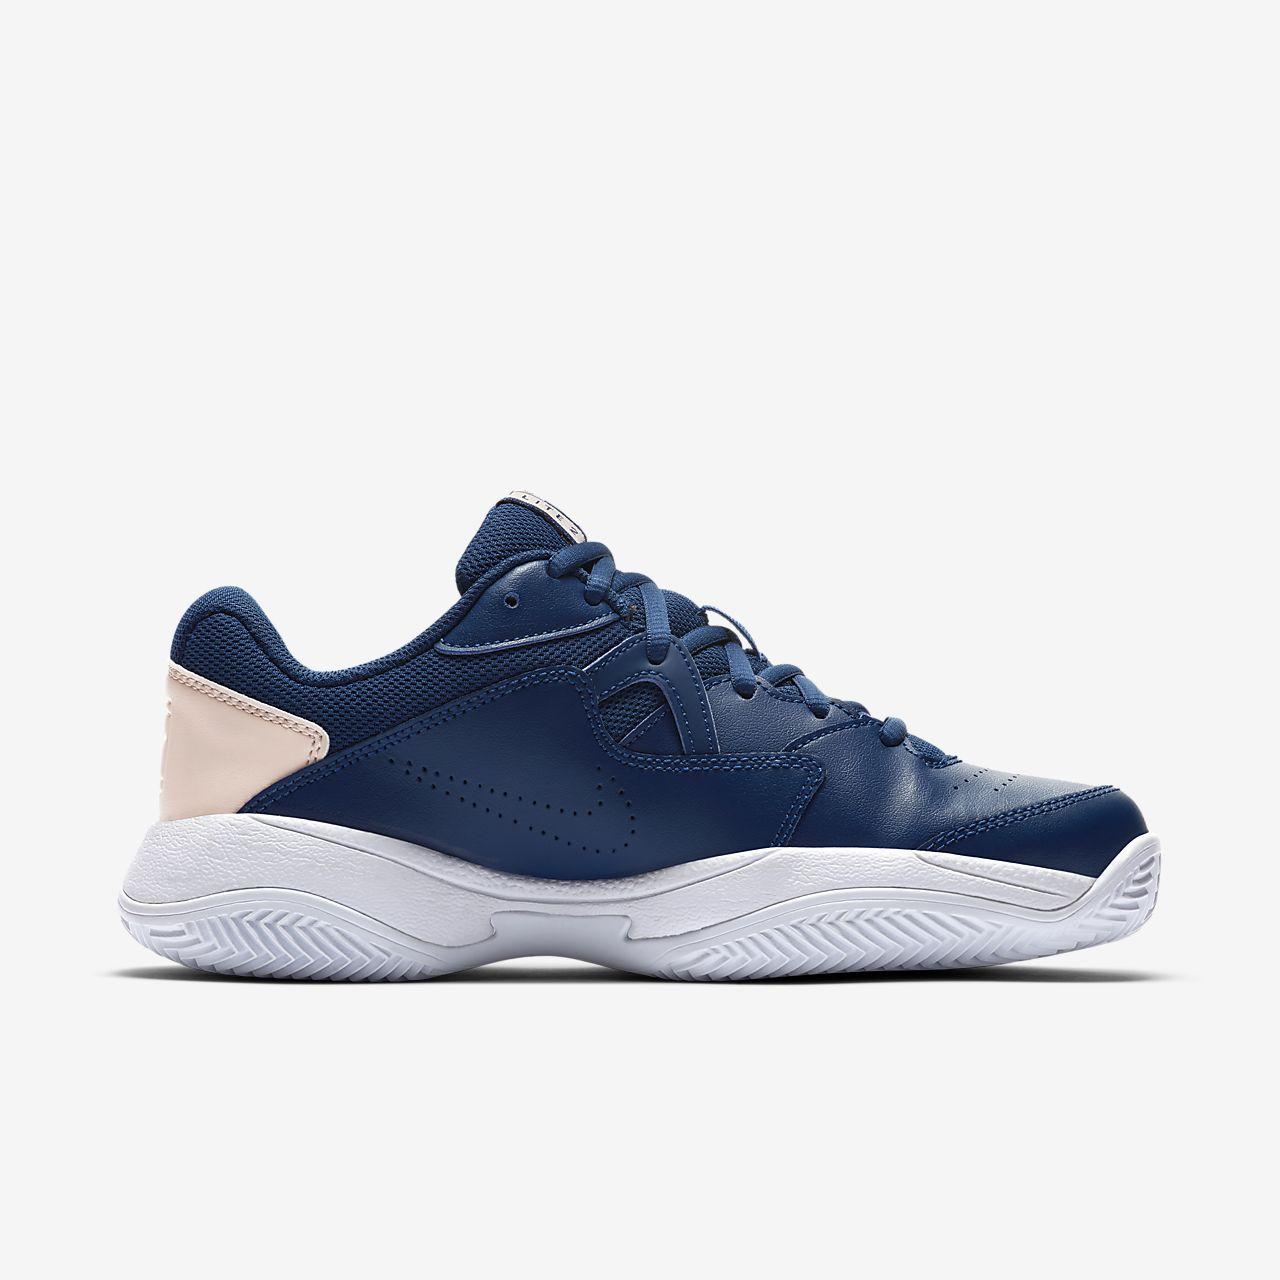 Battue Terre Pour Lite Tennis 2 Nikecourt De Femme Chaussure IED2HYW9